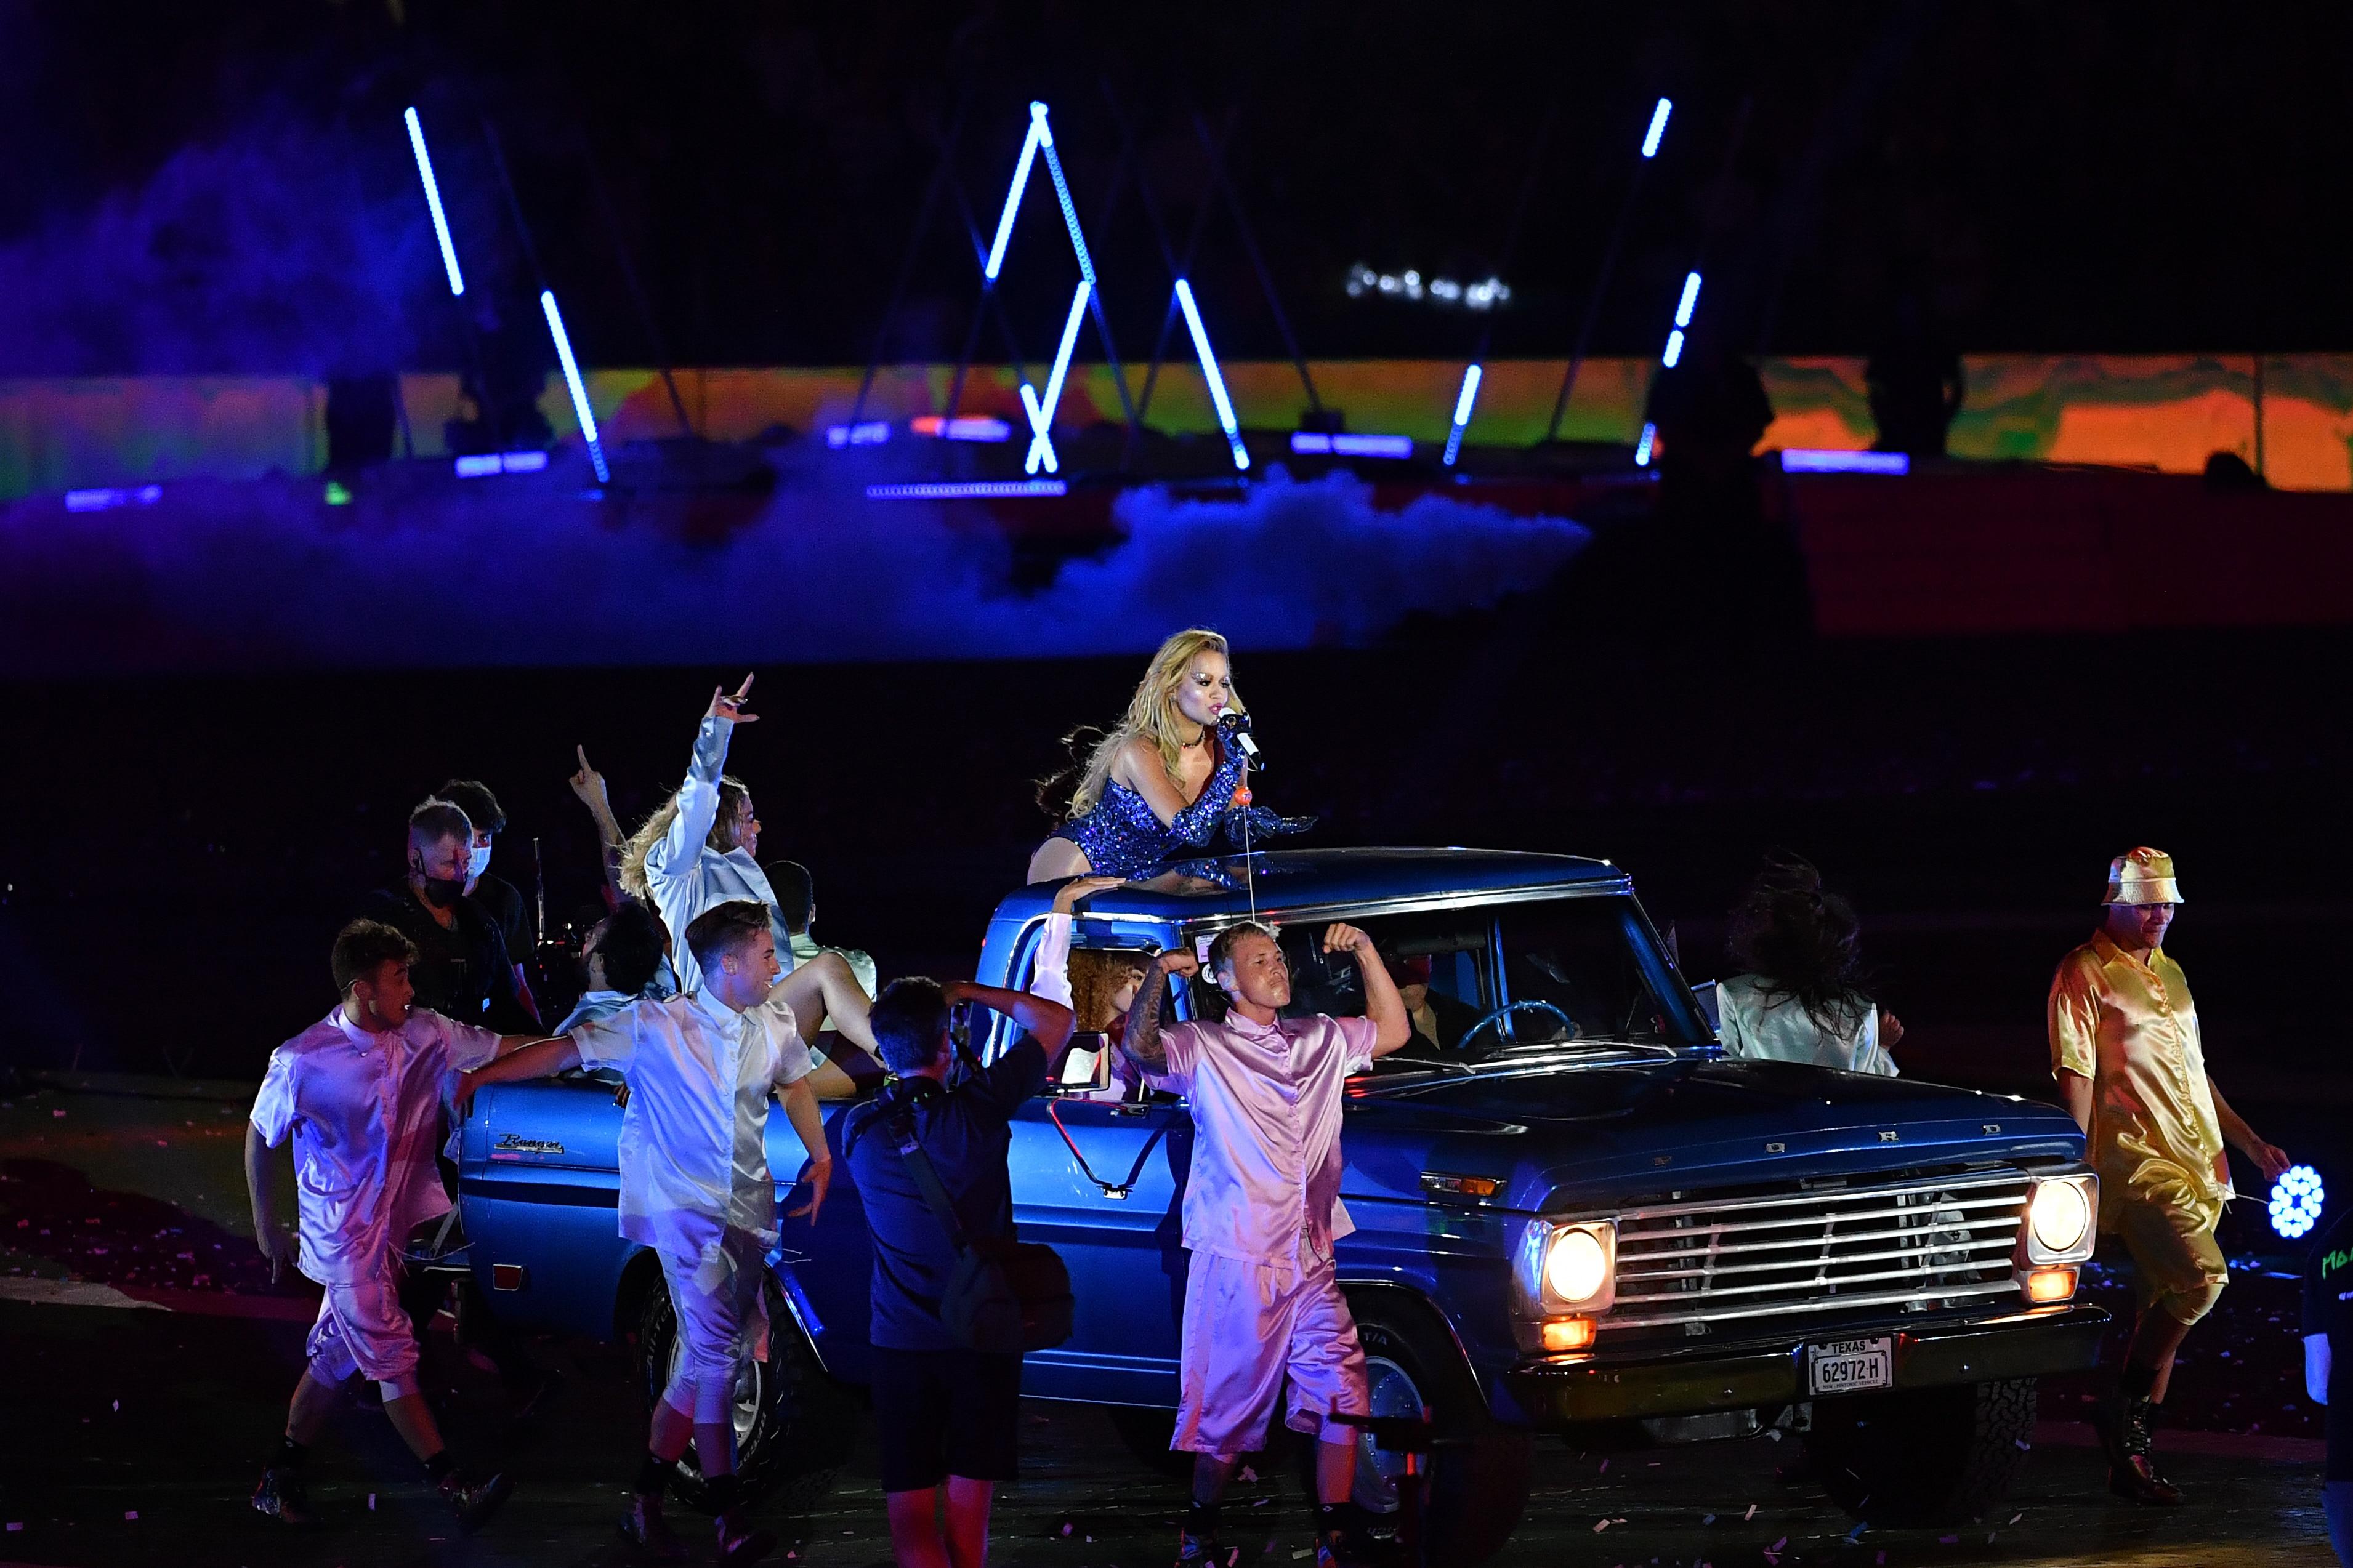 Rita Ora headlined the 43rd annual Sydney Mardi Gras.